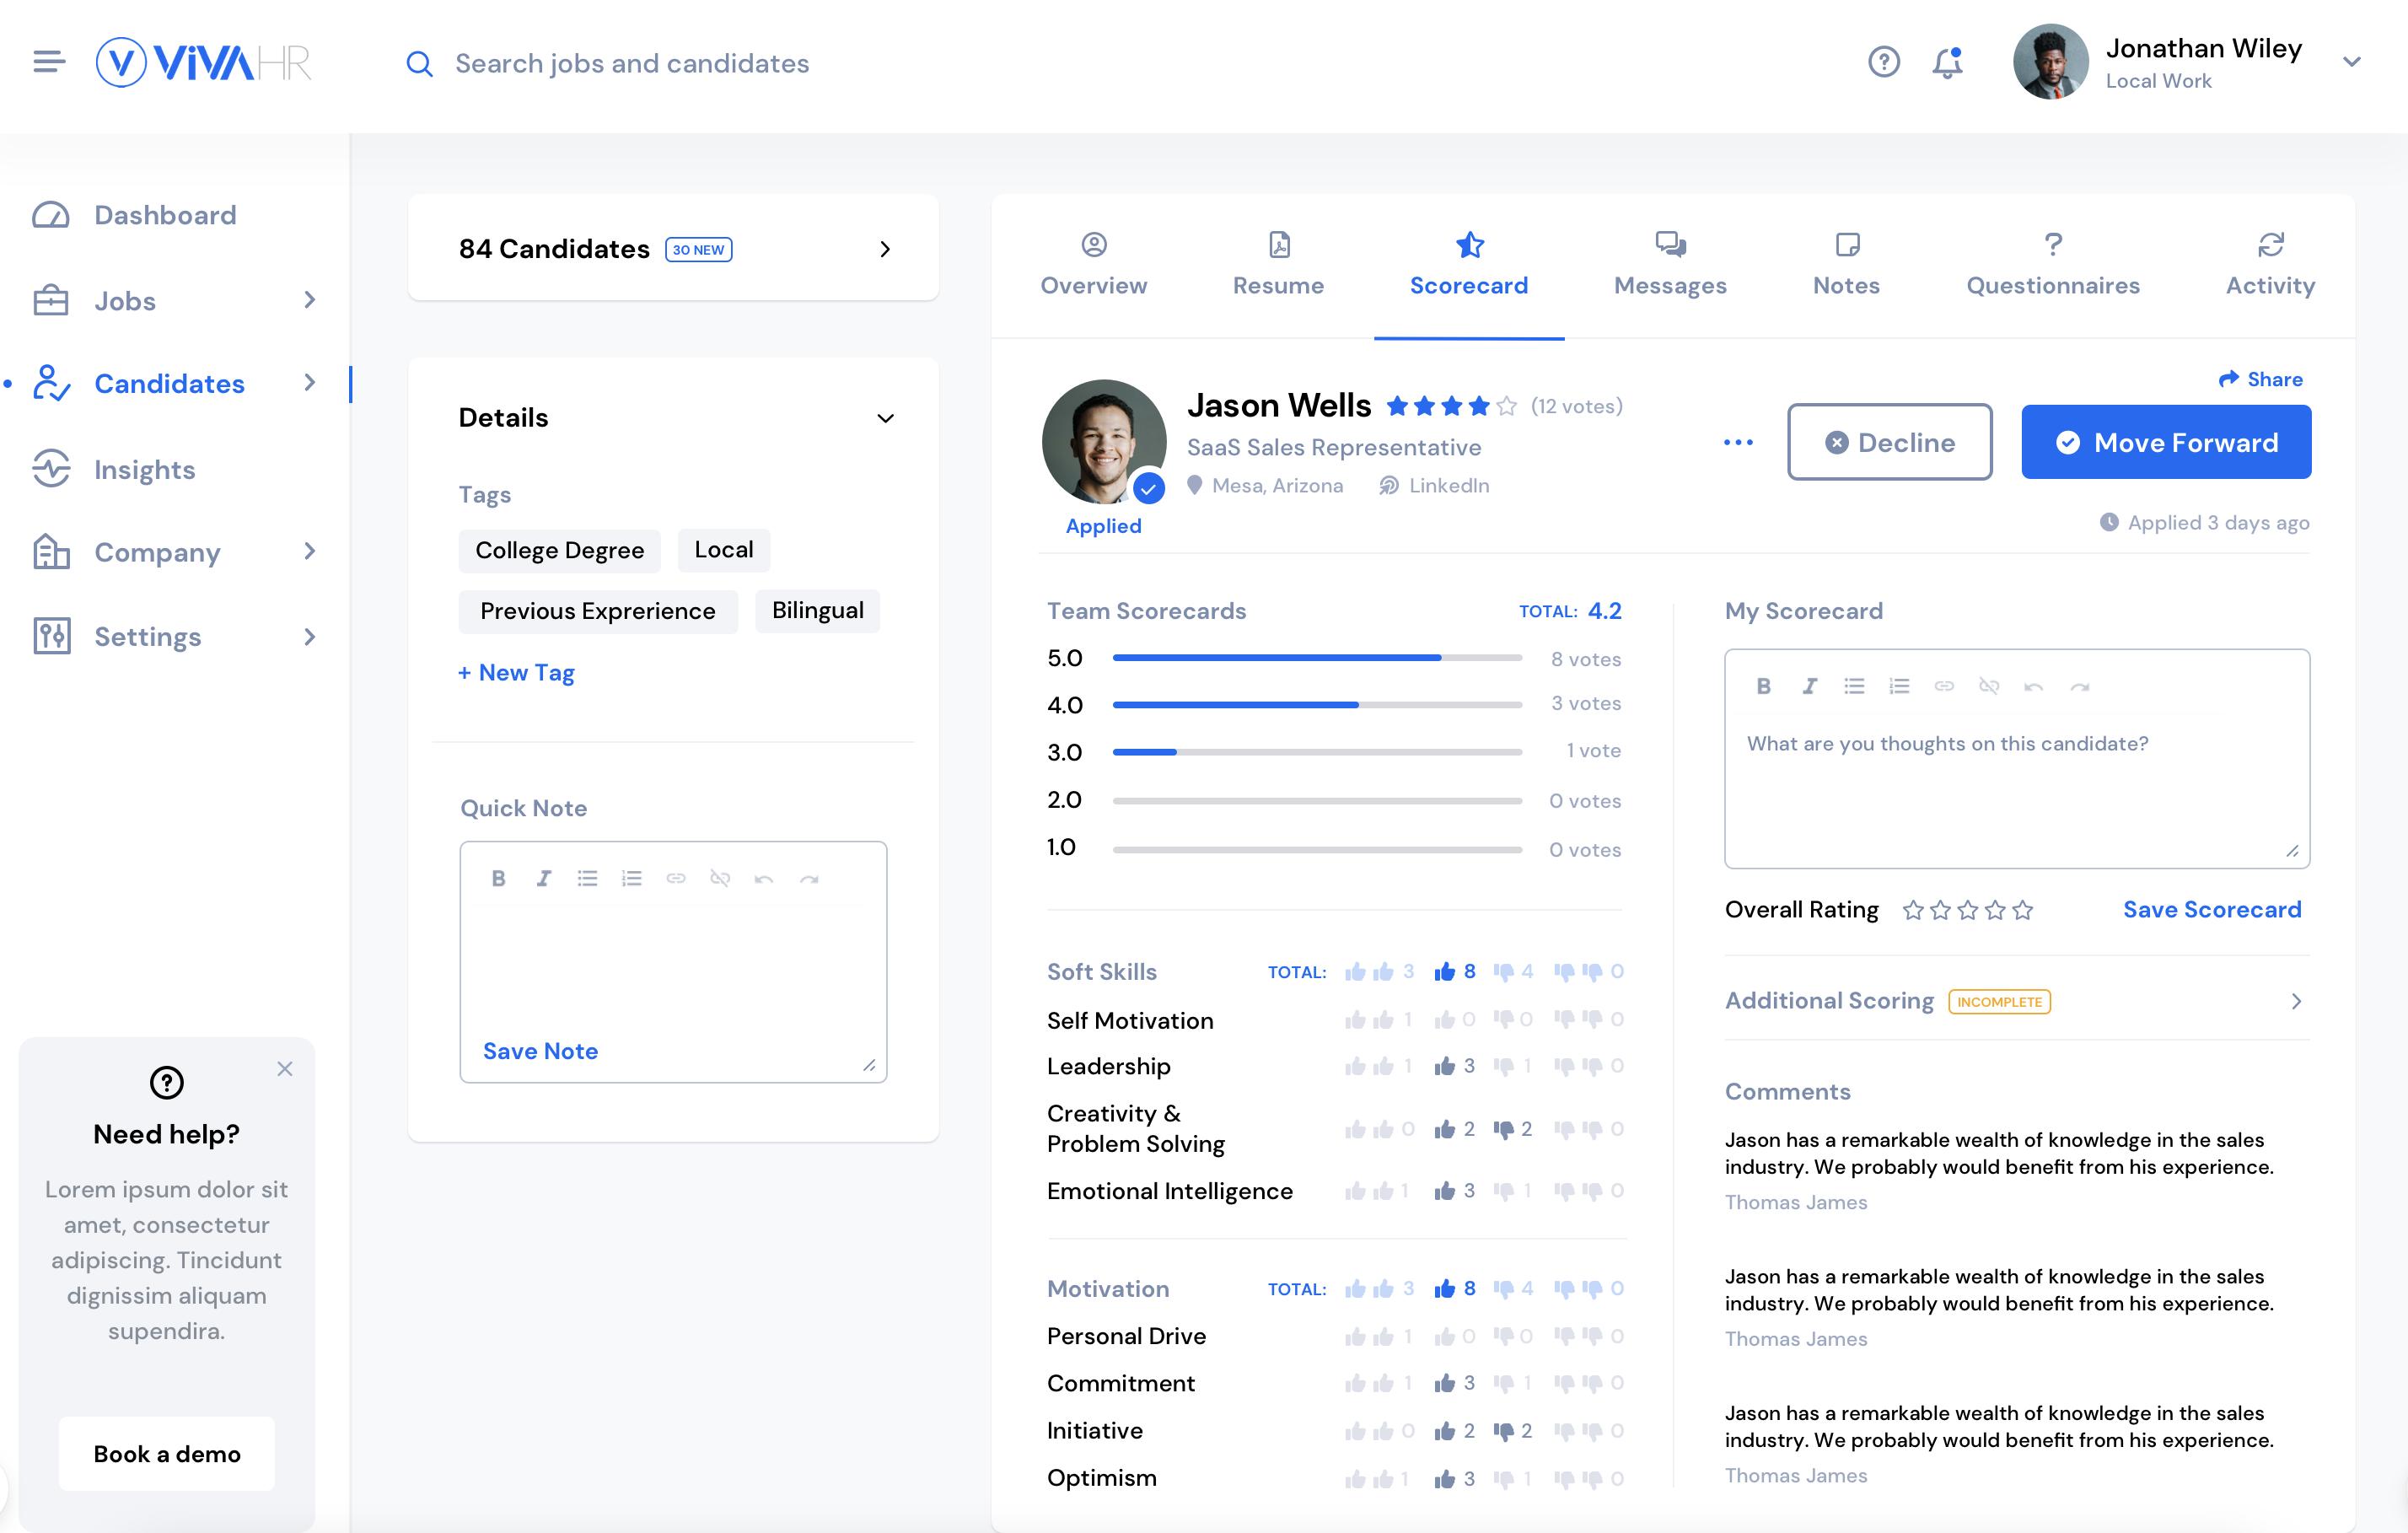 Build unique hiring scorecards to measure each candidate against what matters most.